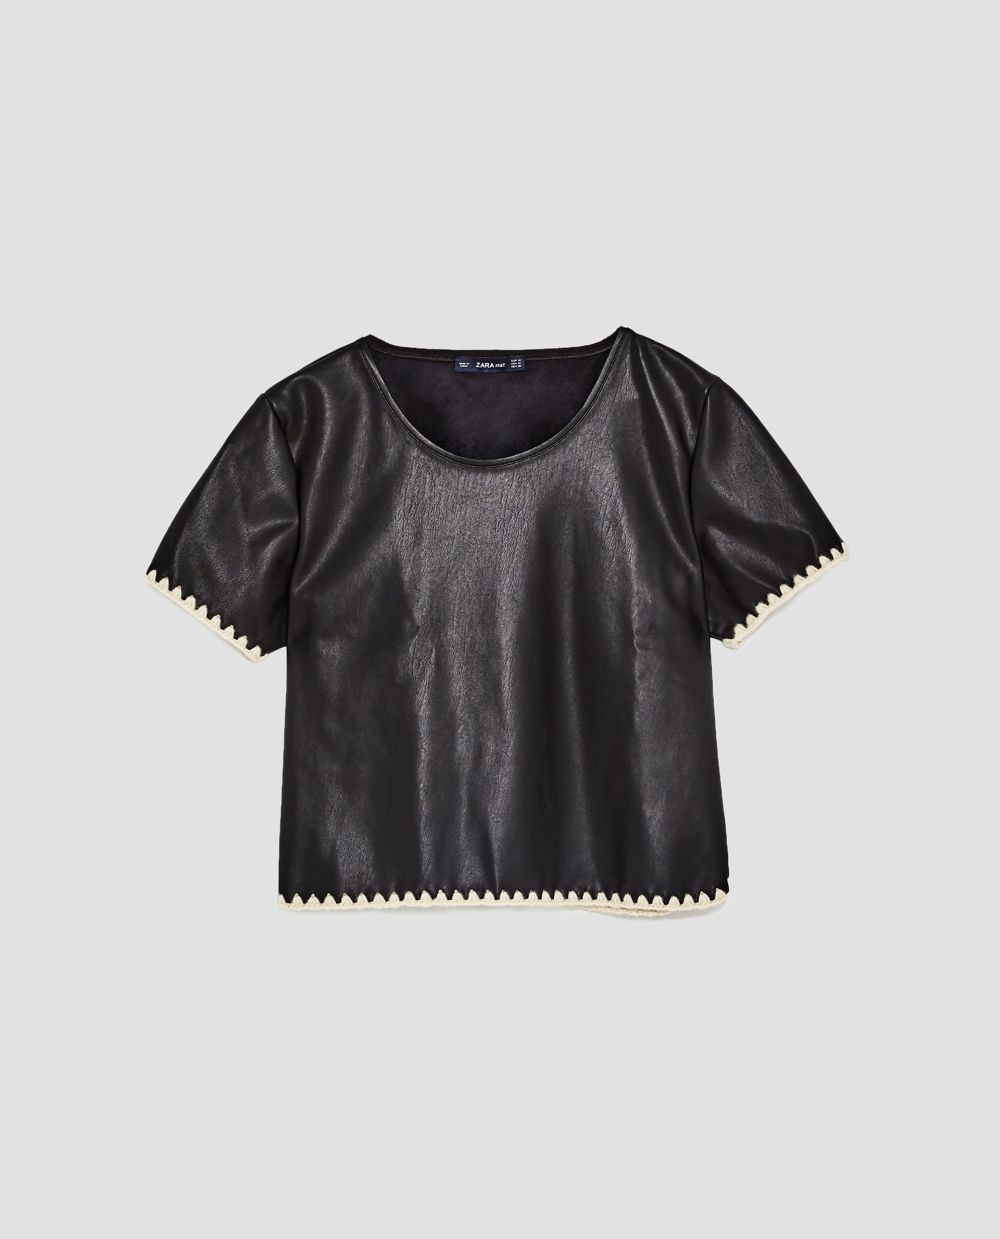 Top efecto piel de Zara (22,95 euros)